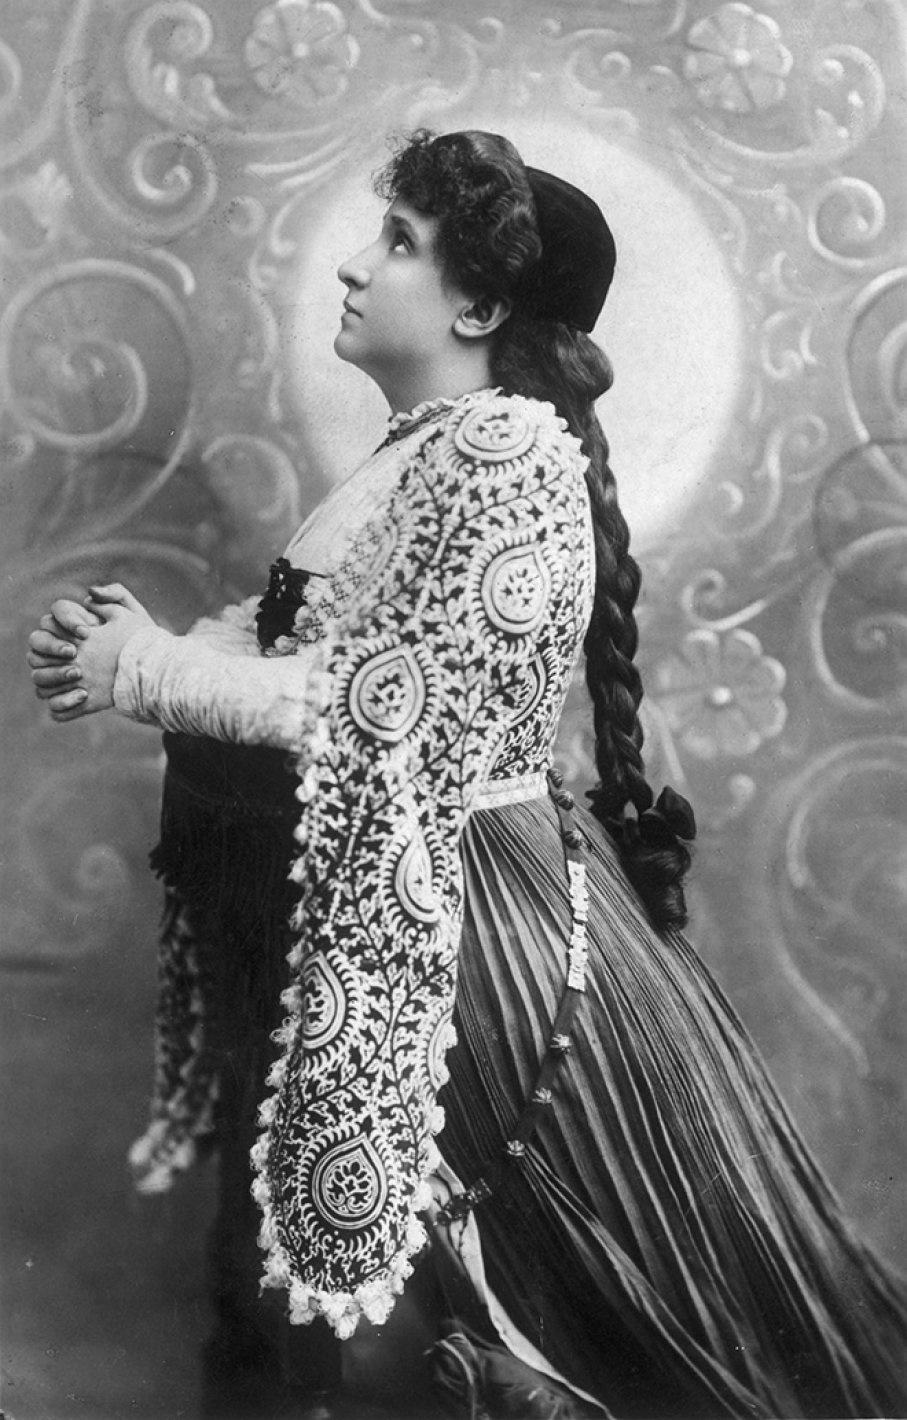 Nellie Melba (1904-1916)